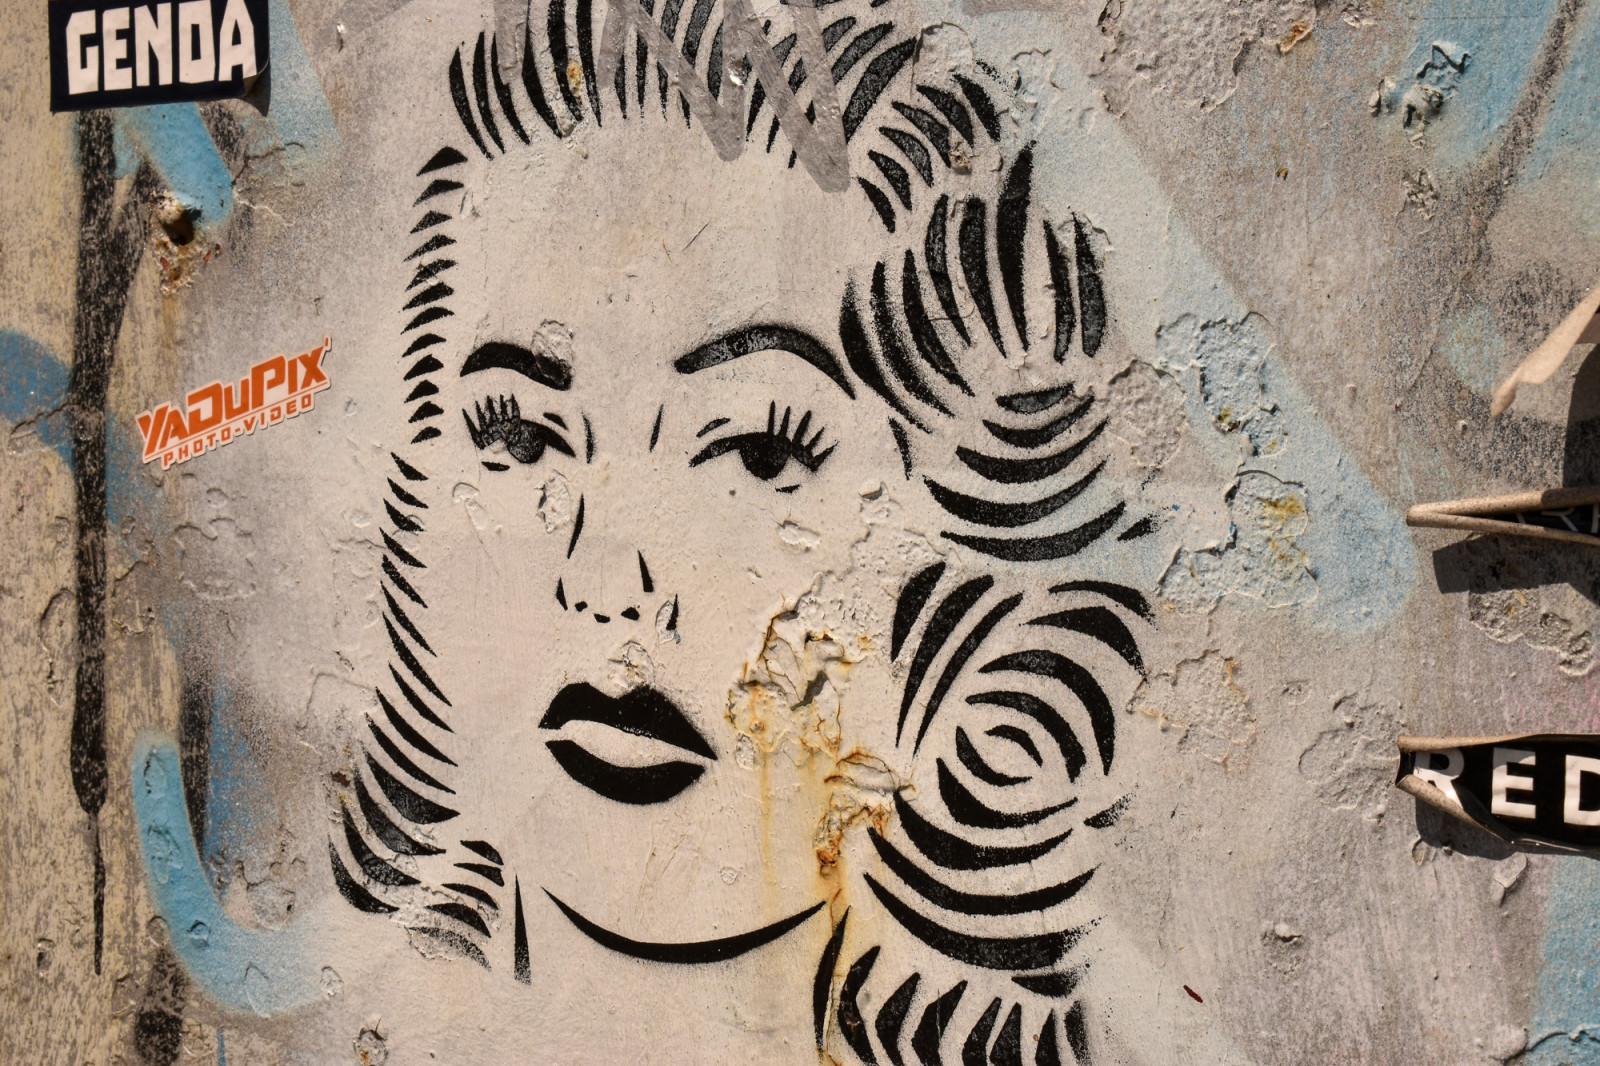 Cool graffiti art in Amsterdam